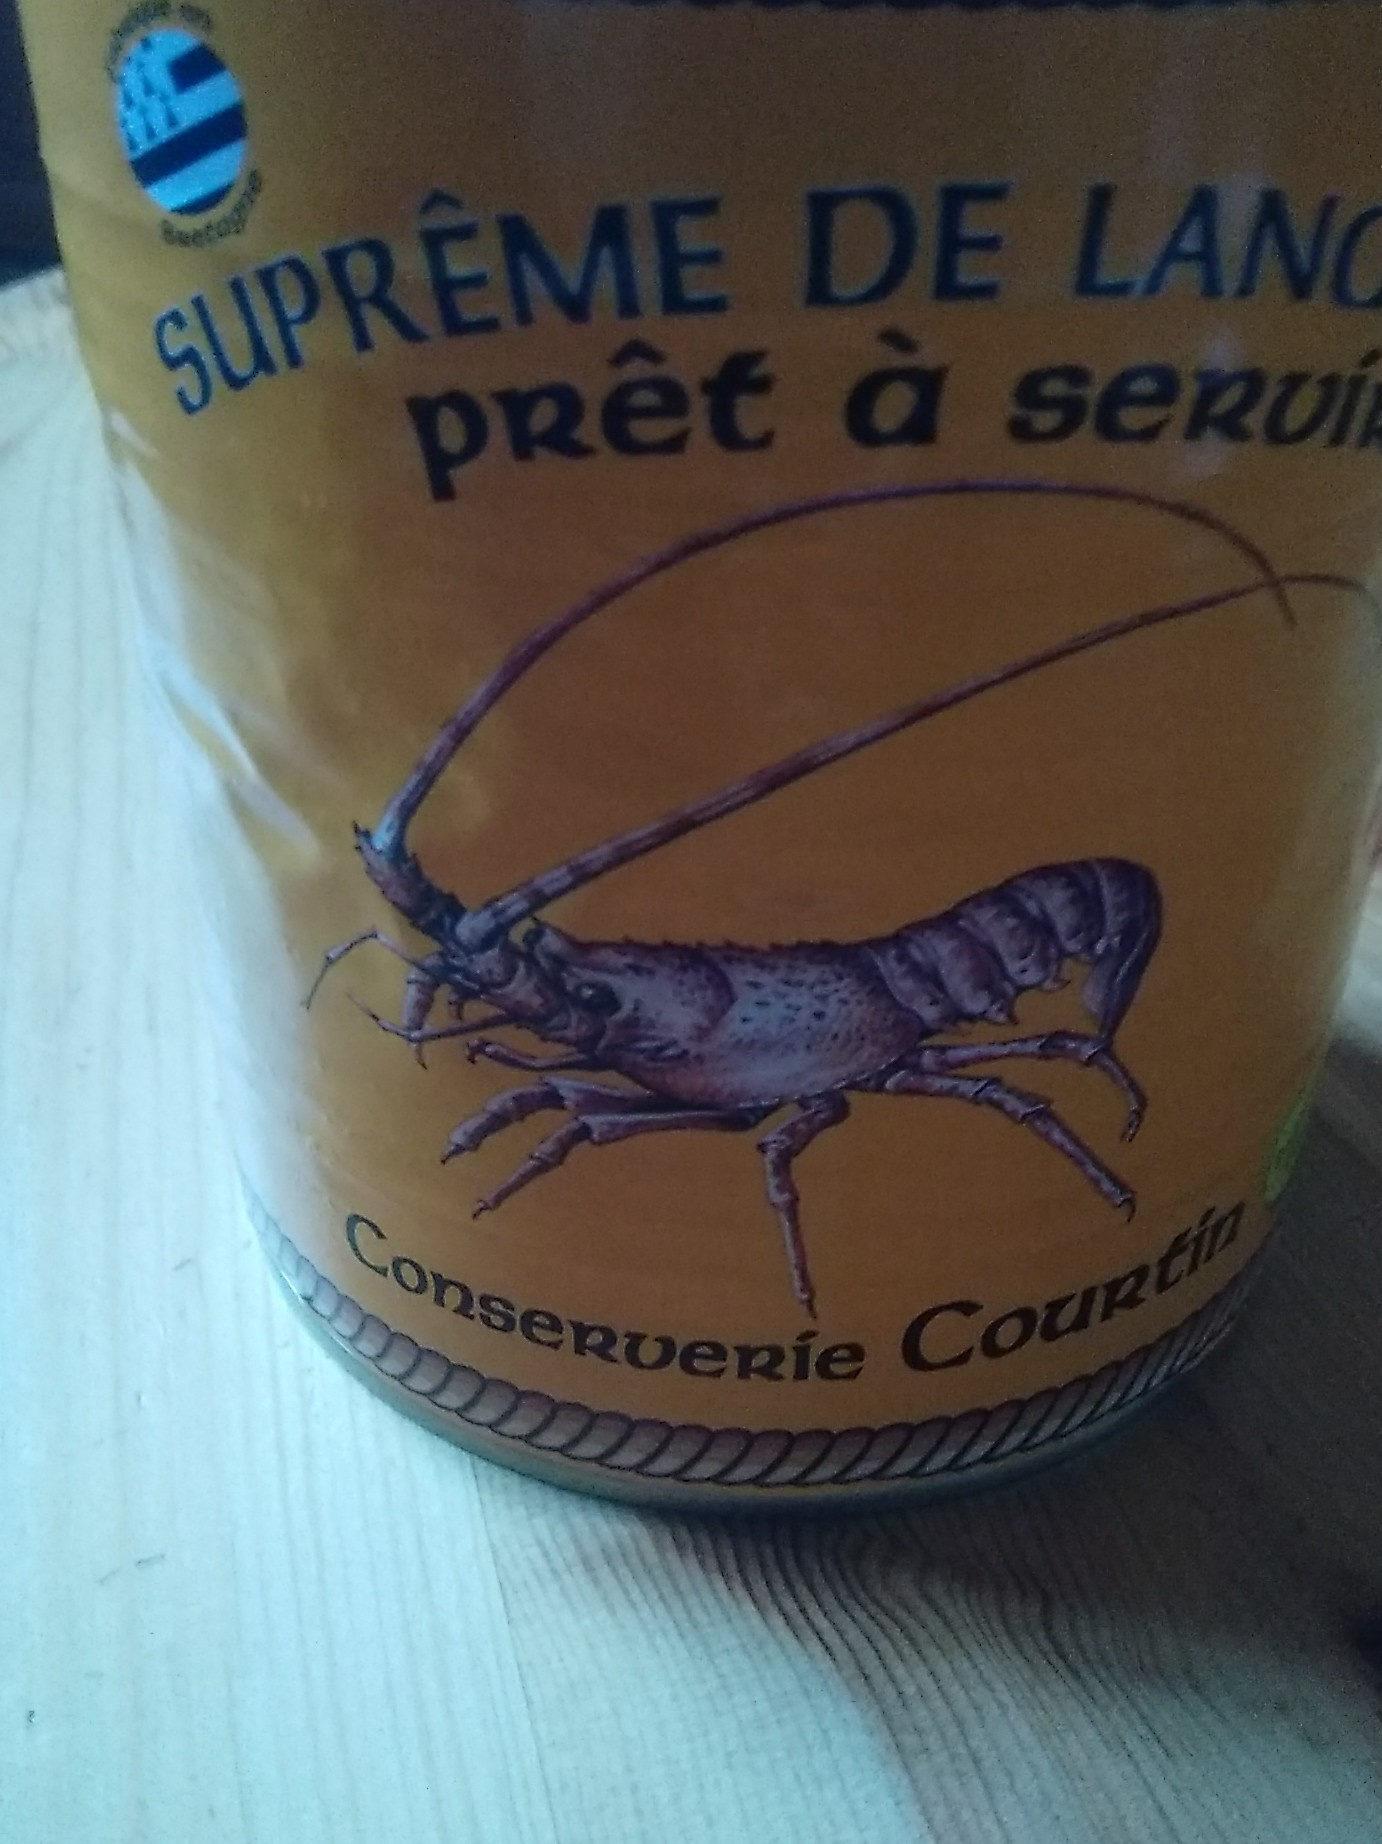 Suprême de langoustine - Produit - fr